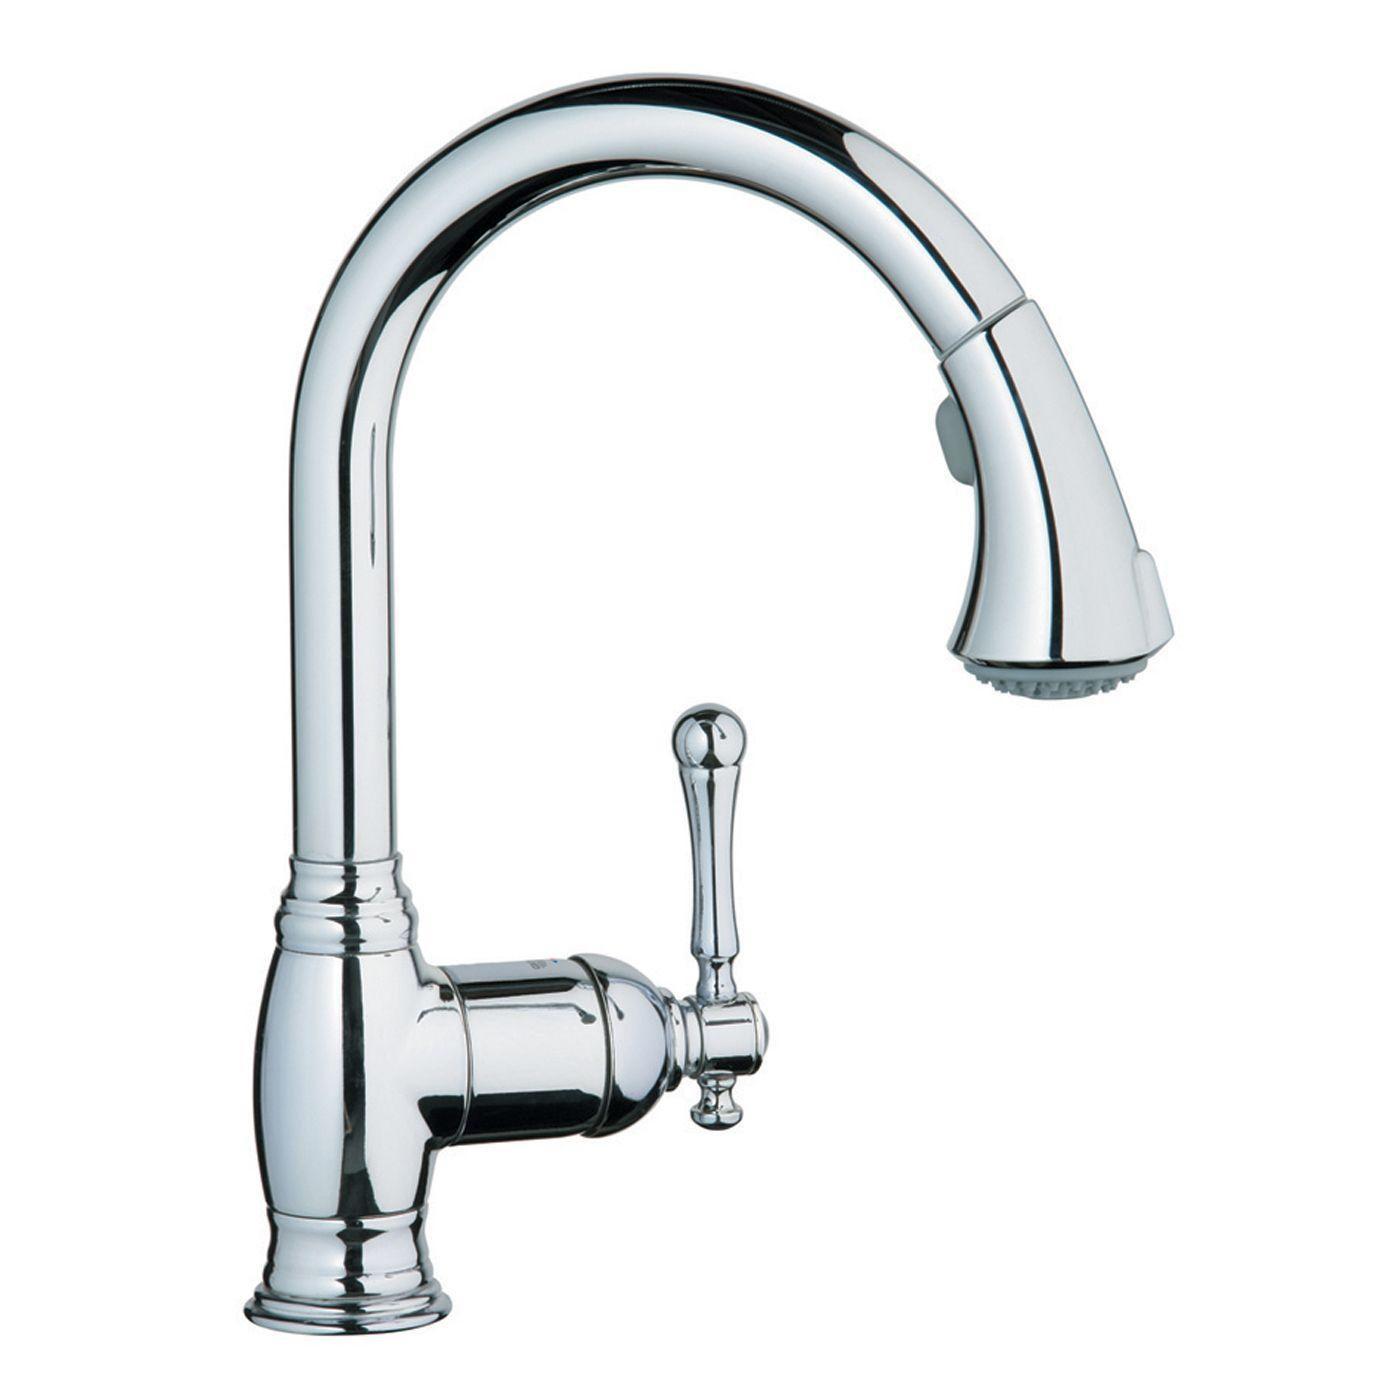 Grohe 33 870 Bridgeford Single Handle Kitchen Faucet